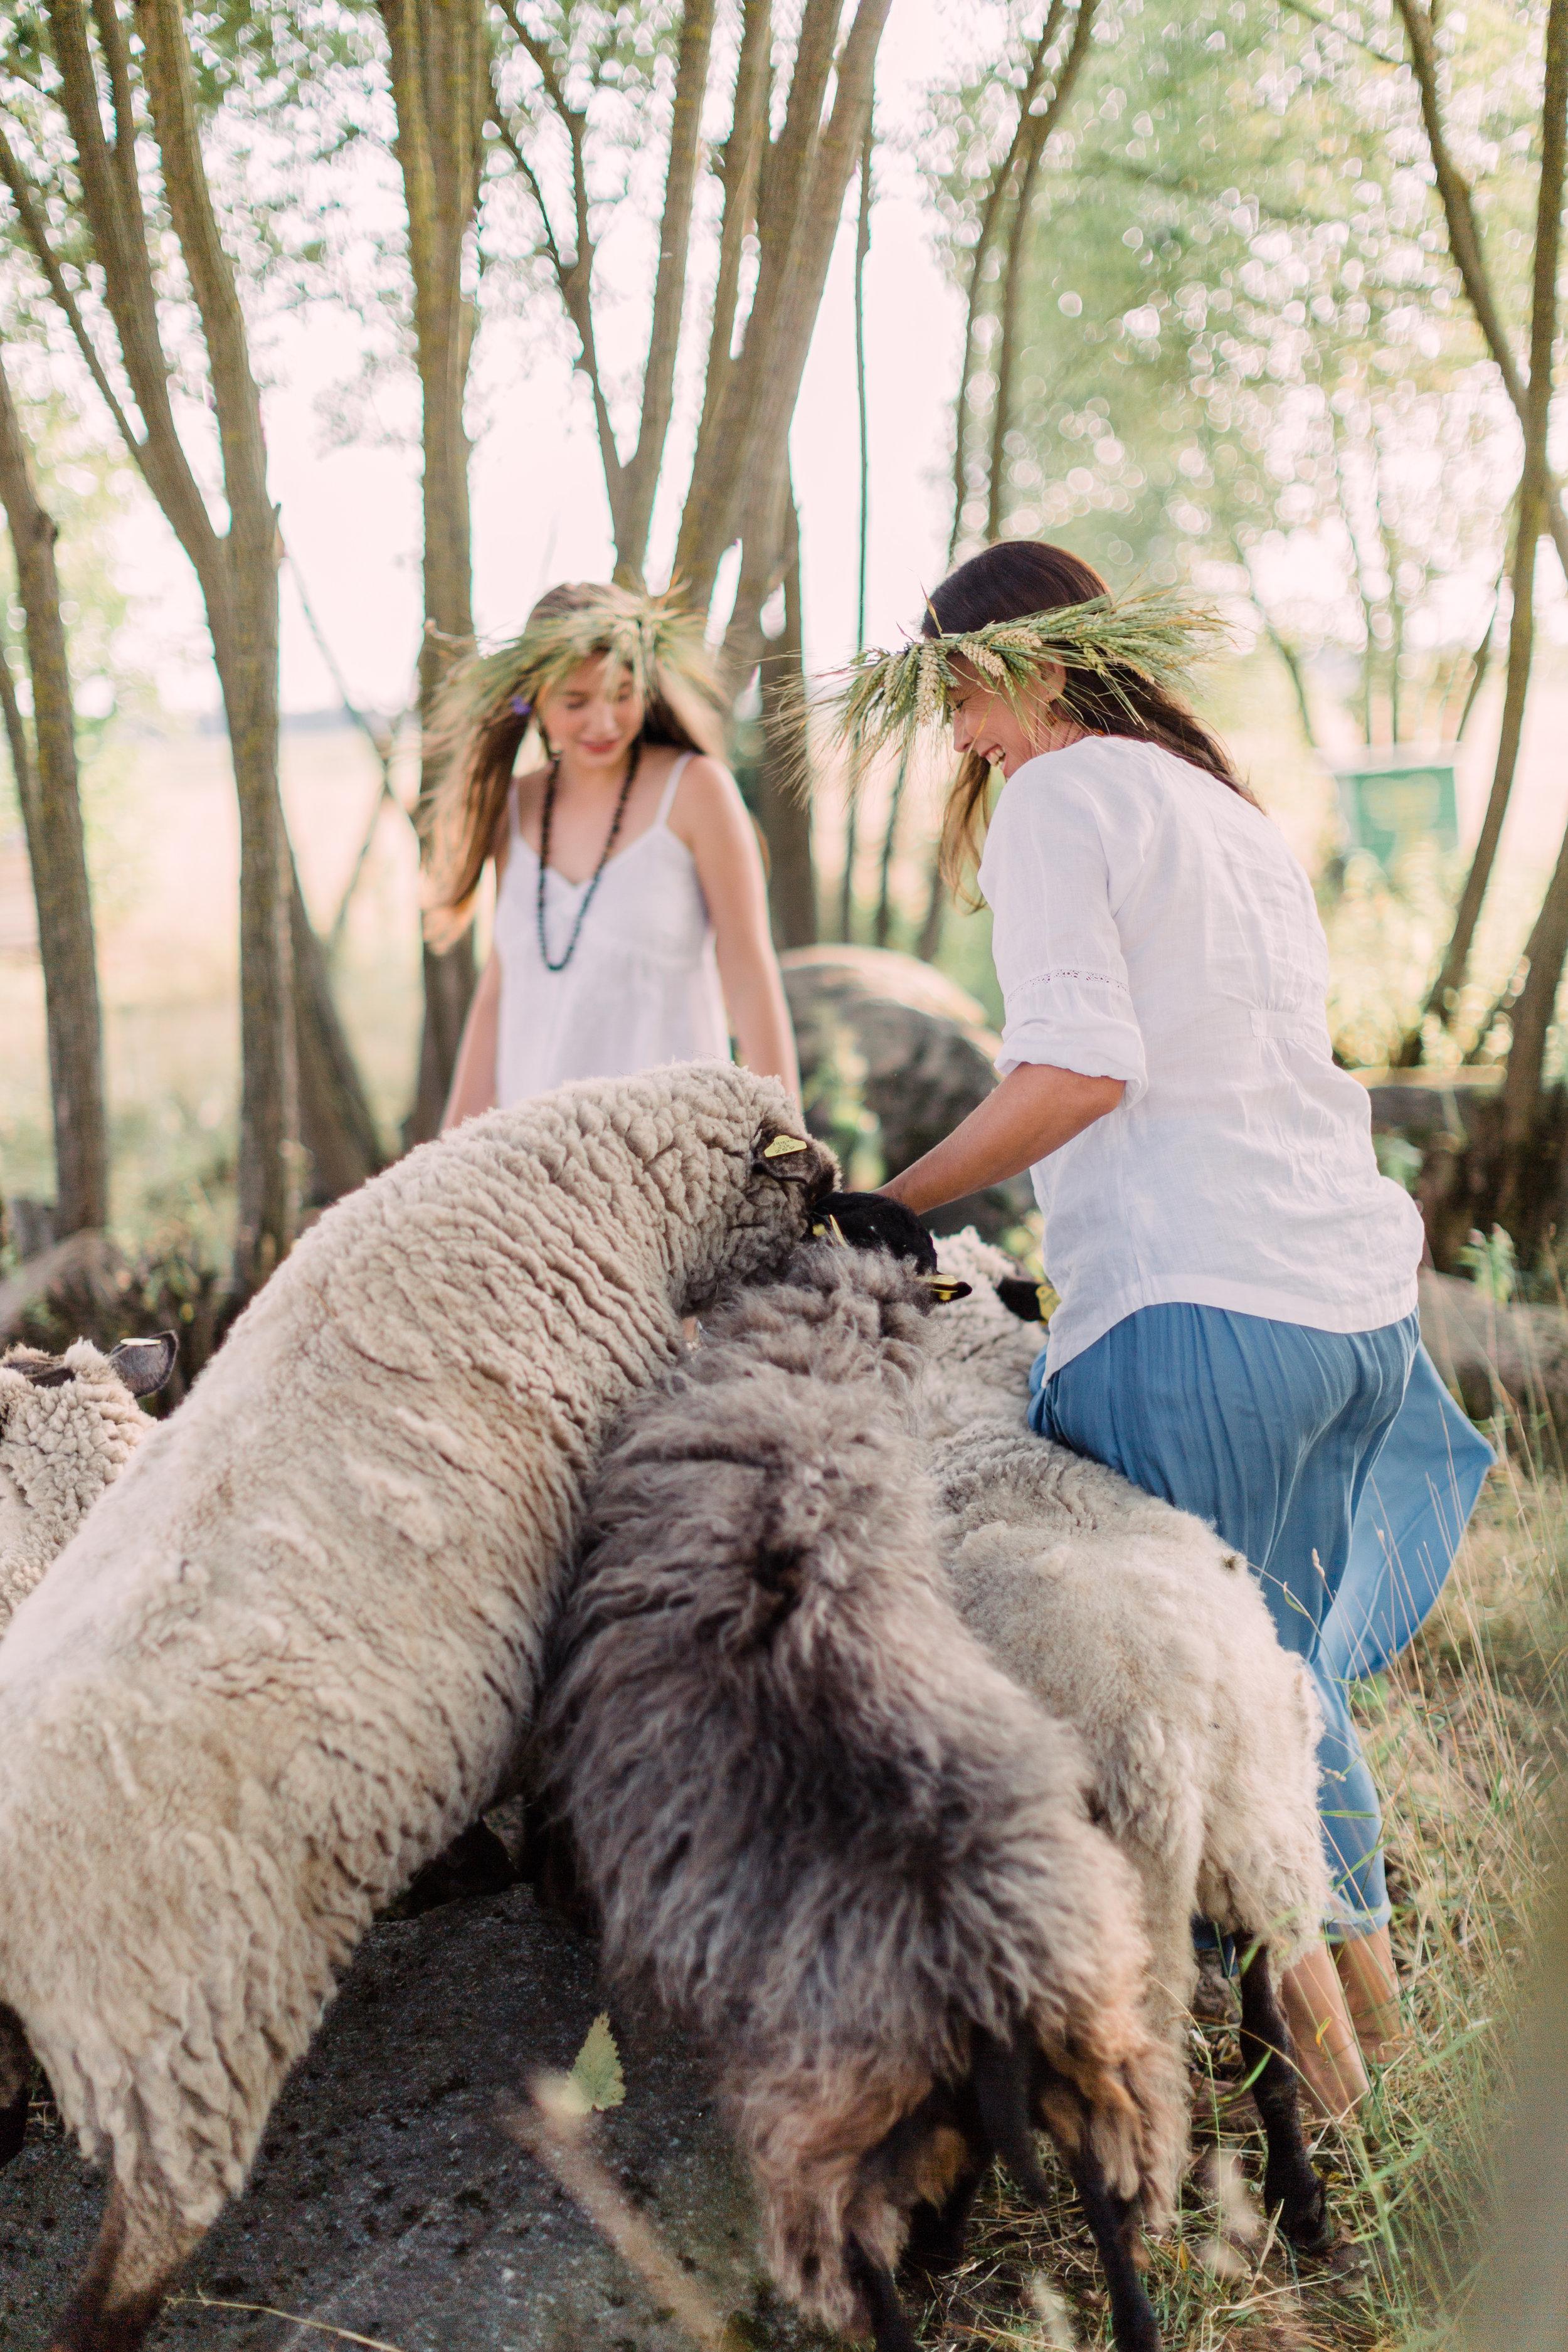 Ieva Birbalaite - Farm Editorial Photo Session_Fine Art Photography_Lithuania_London_UK_2018_Joana Senkute Photography